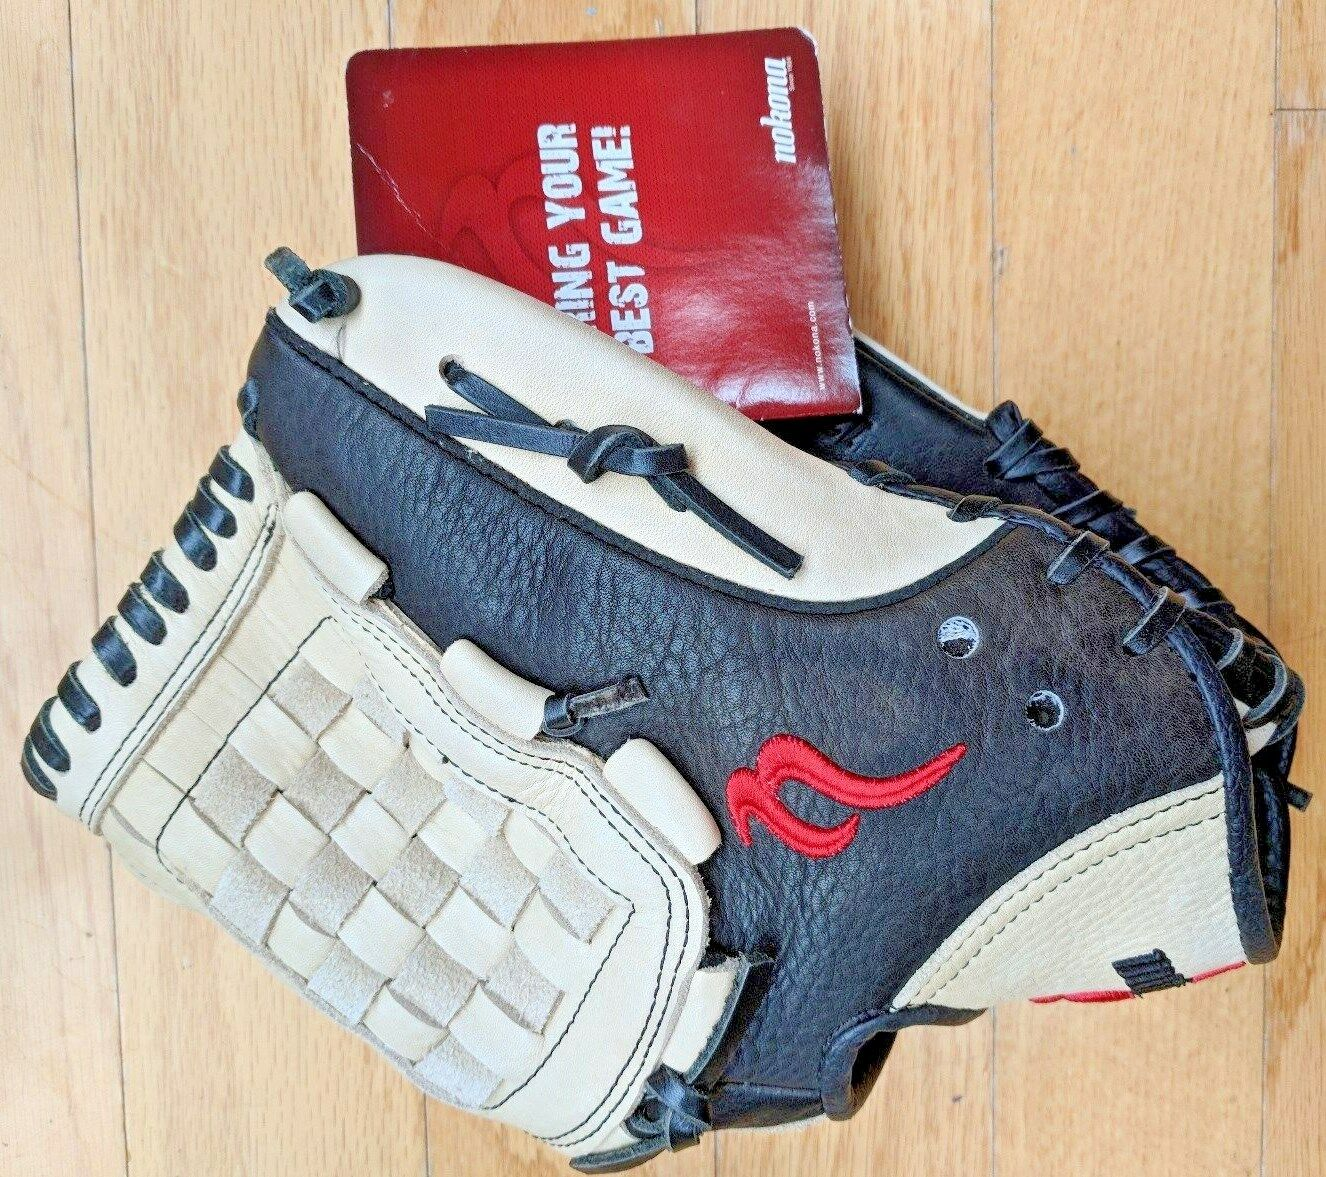 Nokona Kona NKK NKK Kona 1201 Tanned Pelle 12 Inch Baseball Glove (450) RHT - NEW W TAG 44beec